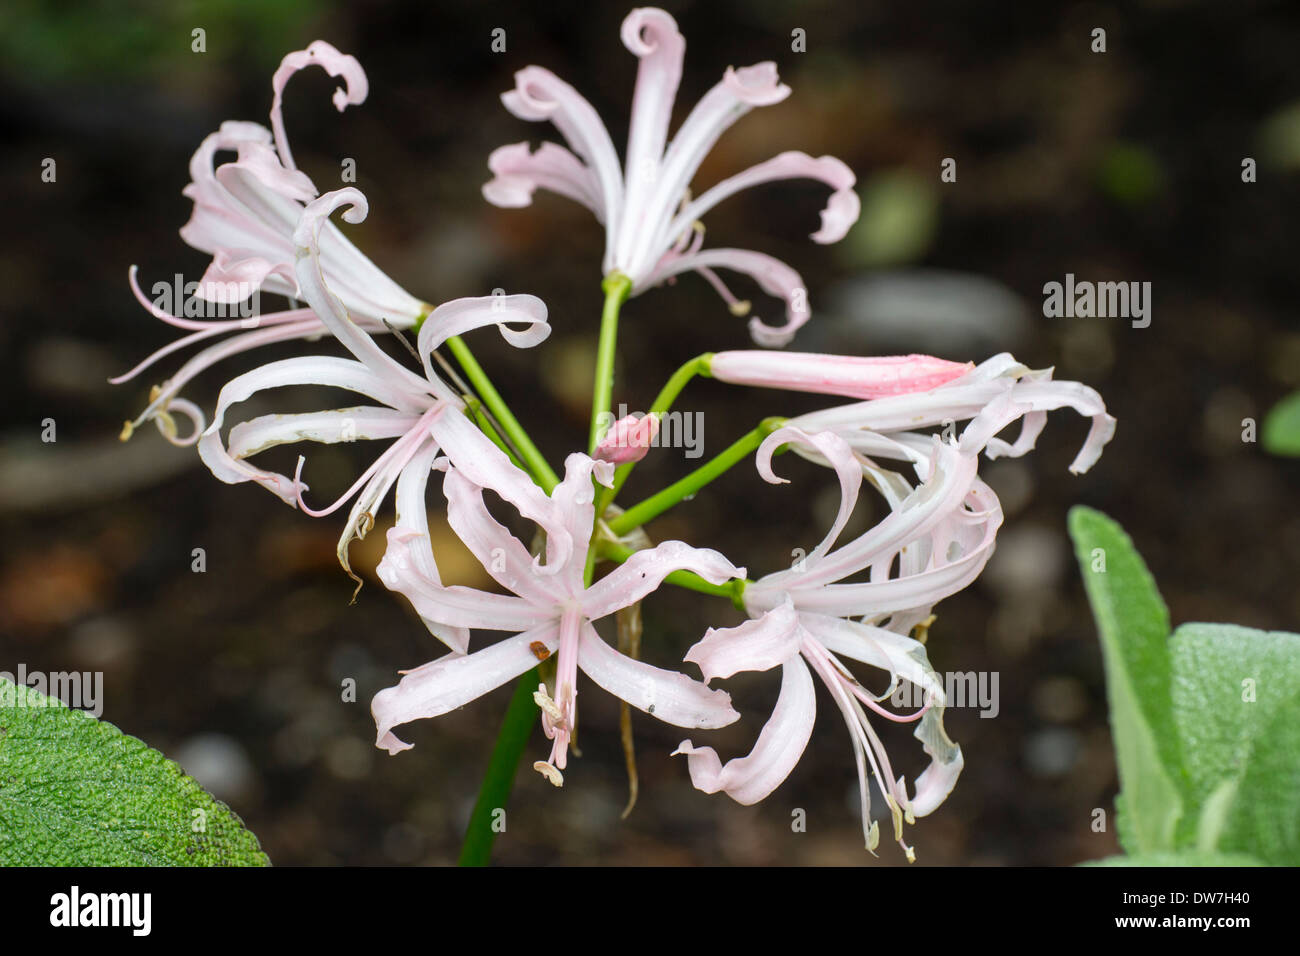 Single flower head of the narrow petalled pale pink Nerine bowdenii 'Stephanie' - Stock Image